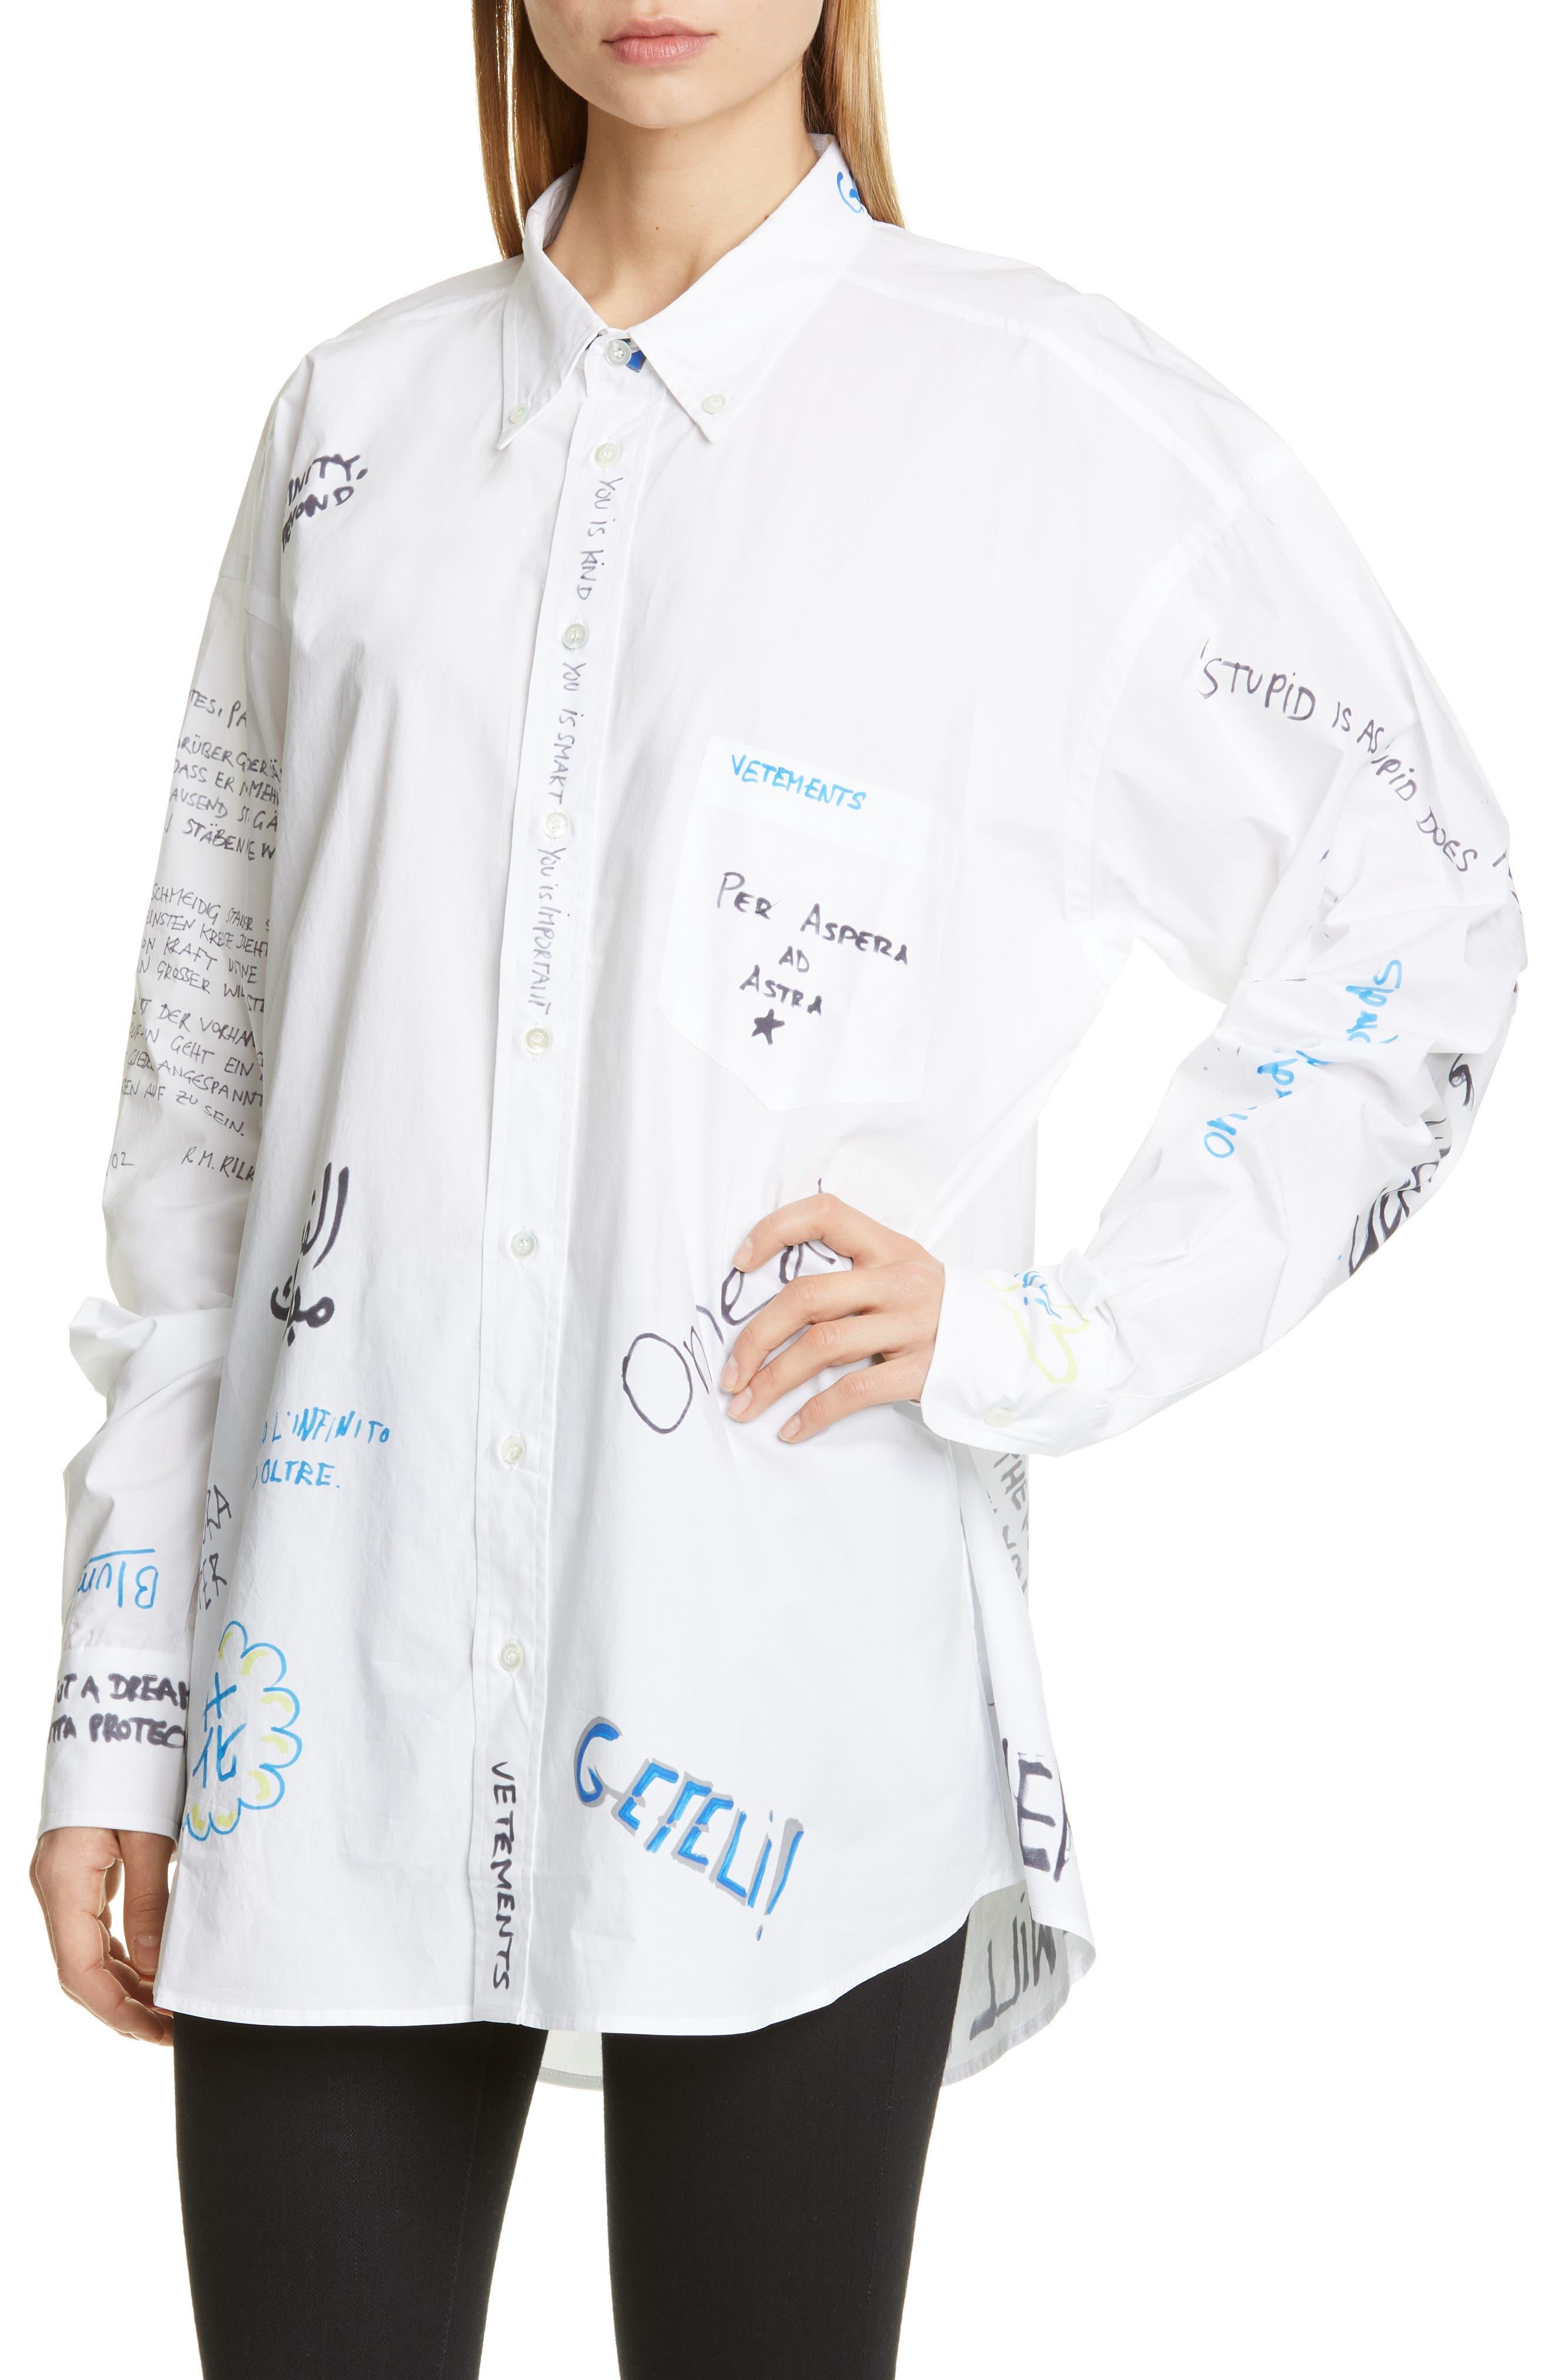 VETEMENTS, Scribble Print Oversize Shirt, Alternate thumbnail 4, color, WHITE